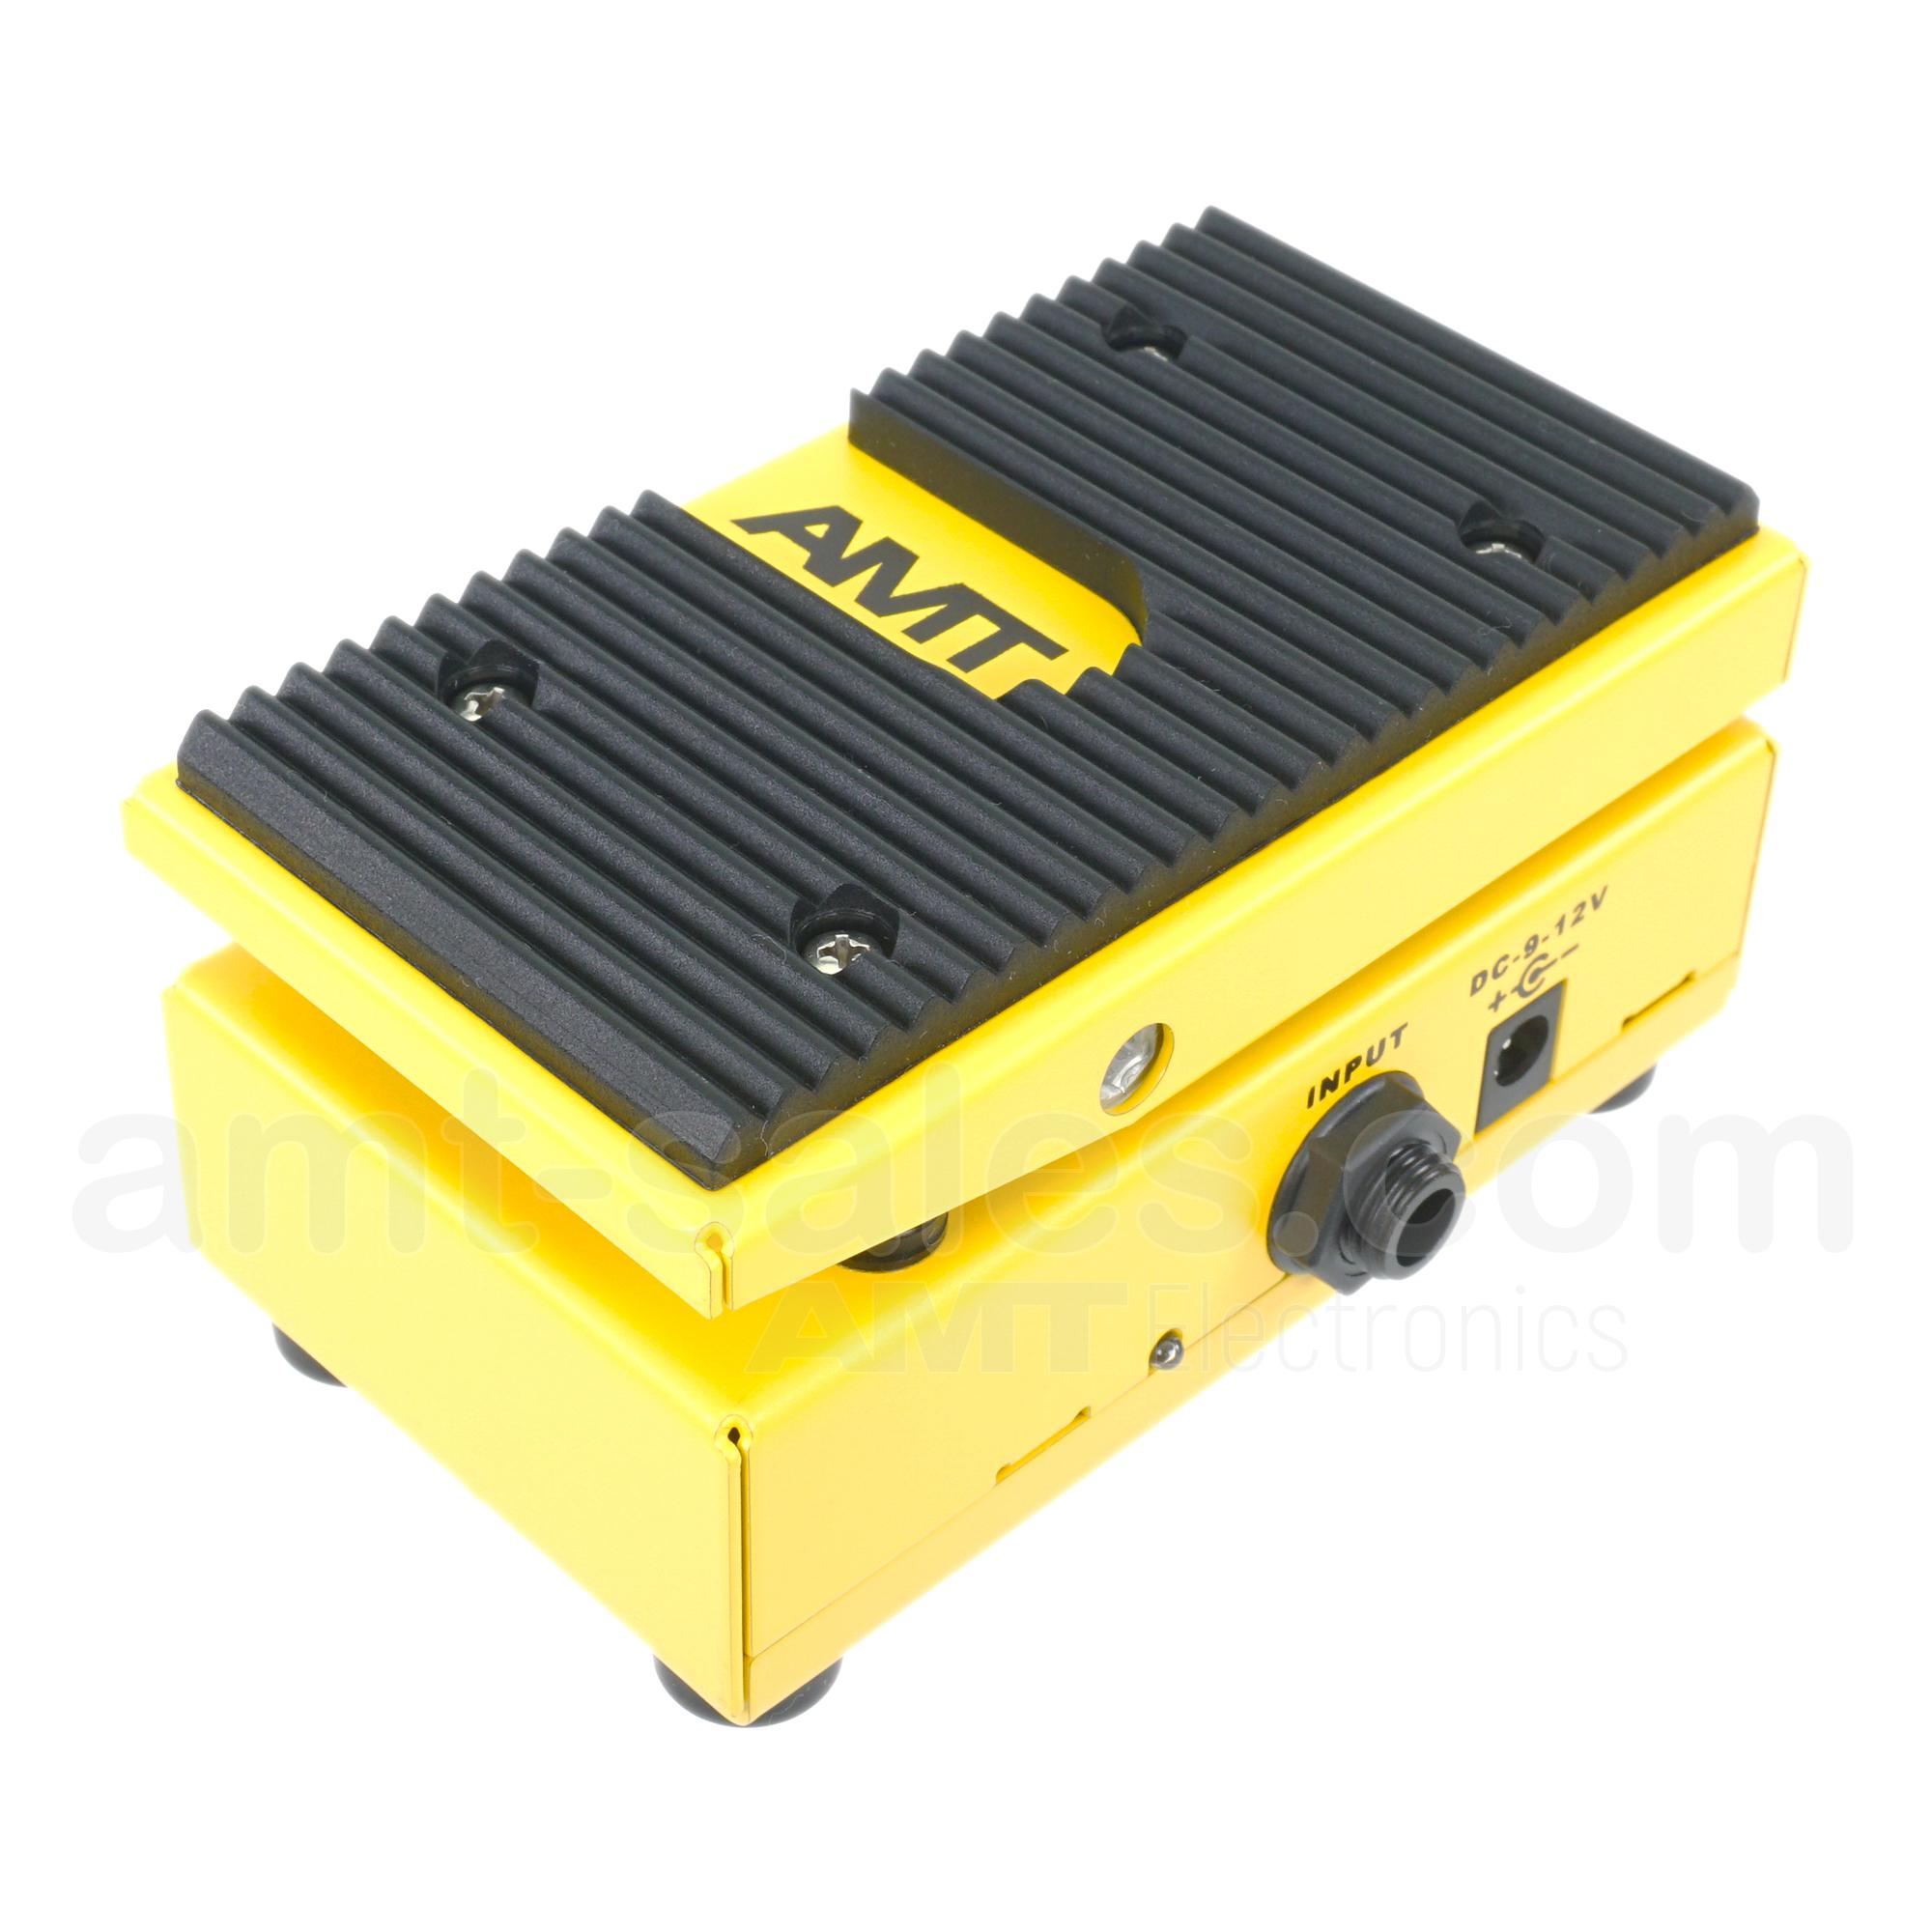 AMT LLM-2 ZERO - Optical Volume Pedal